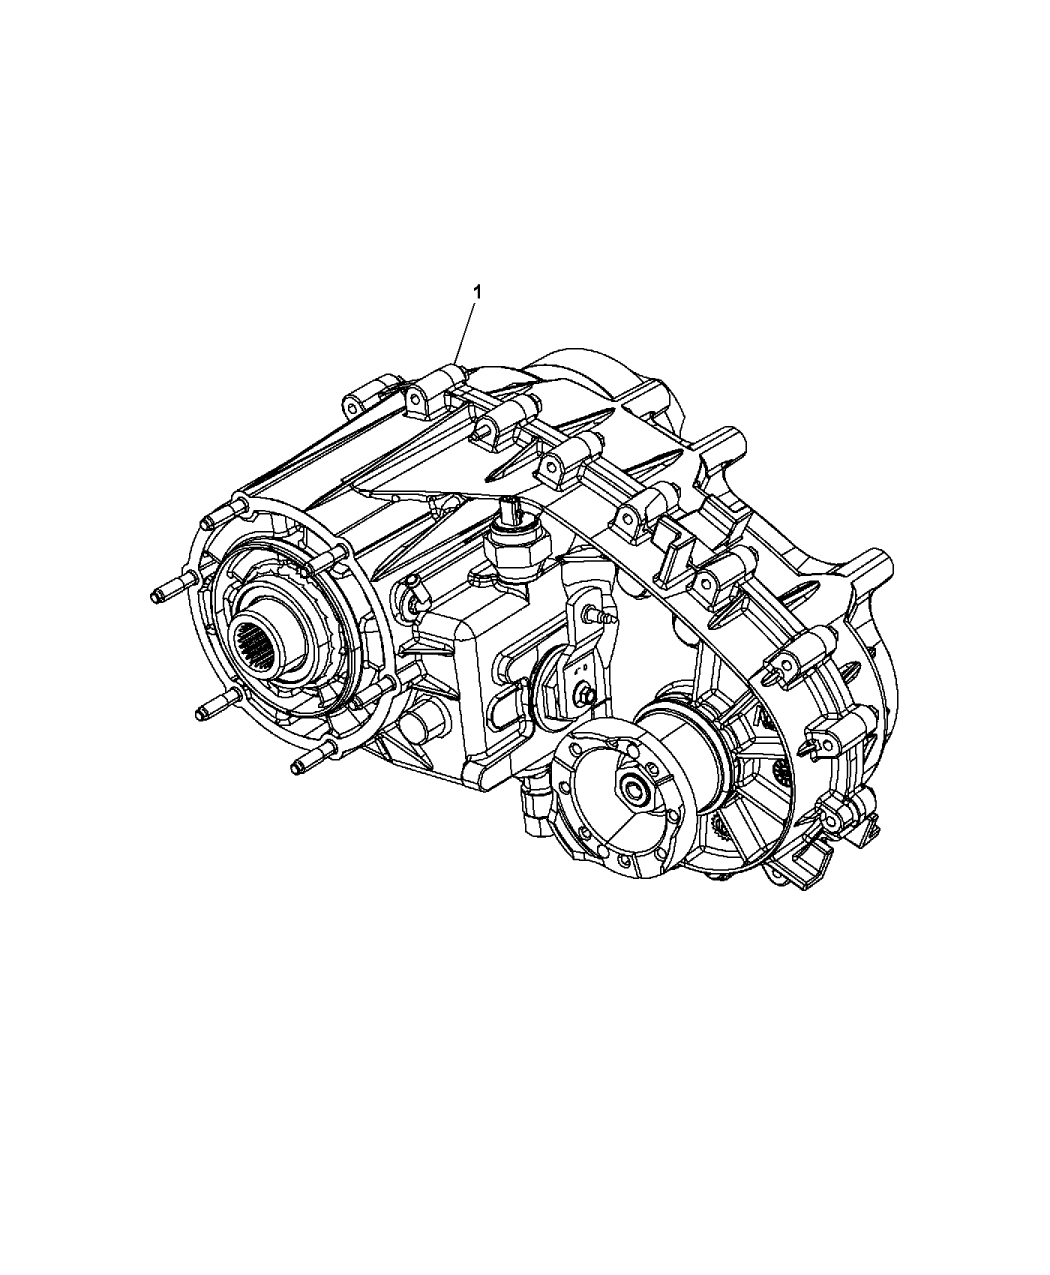 2014 Jeep Wrangler Transfer Case Assembly - Mopar Parts Giant